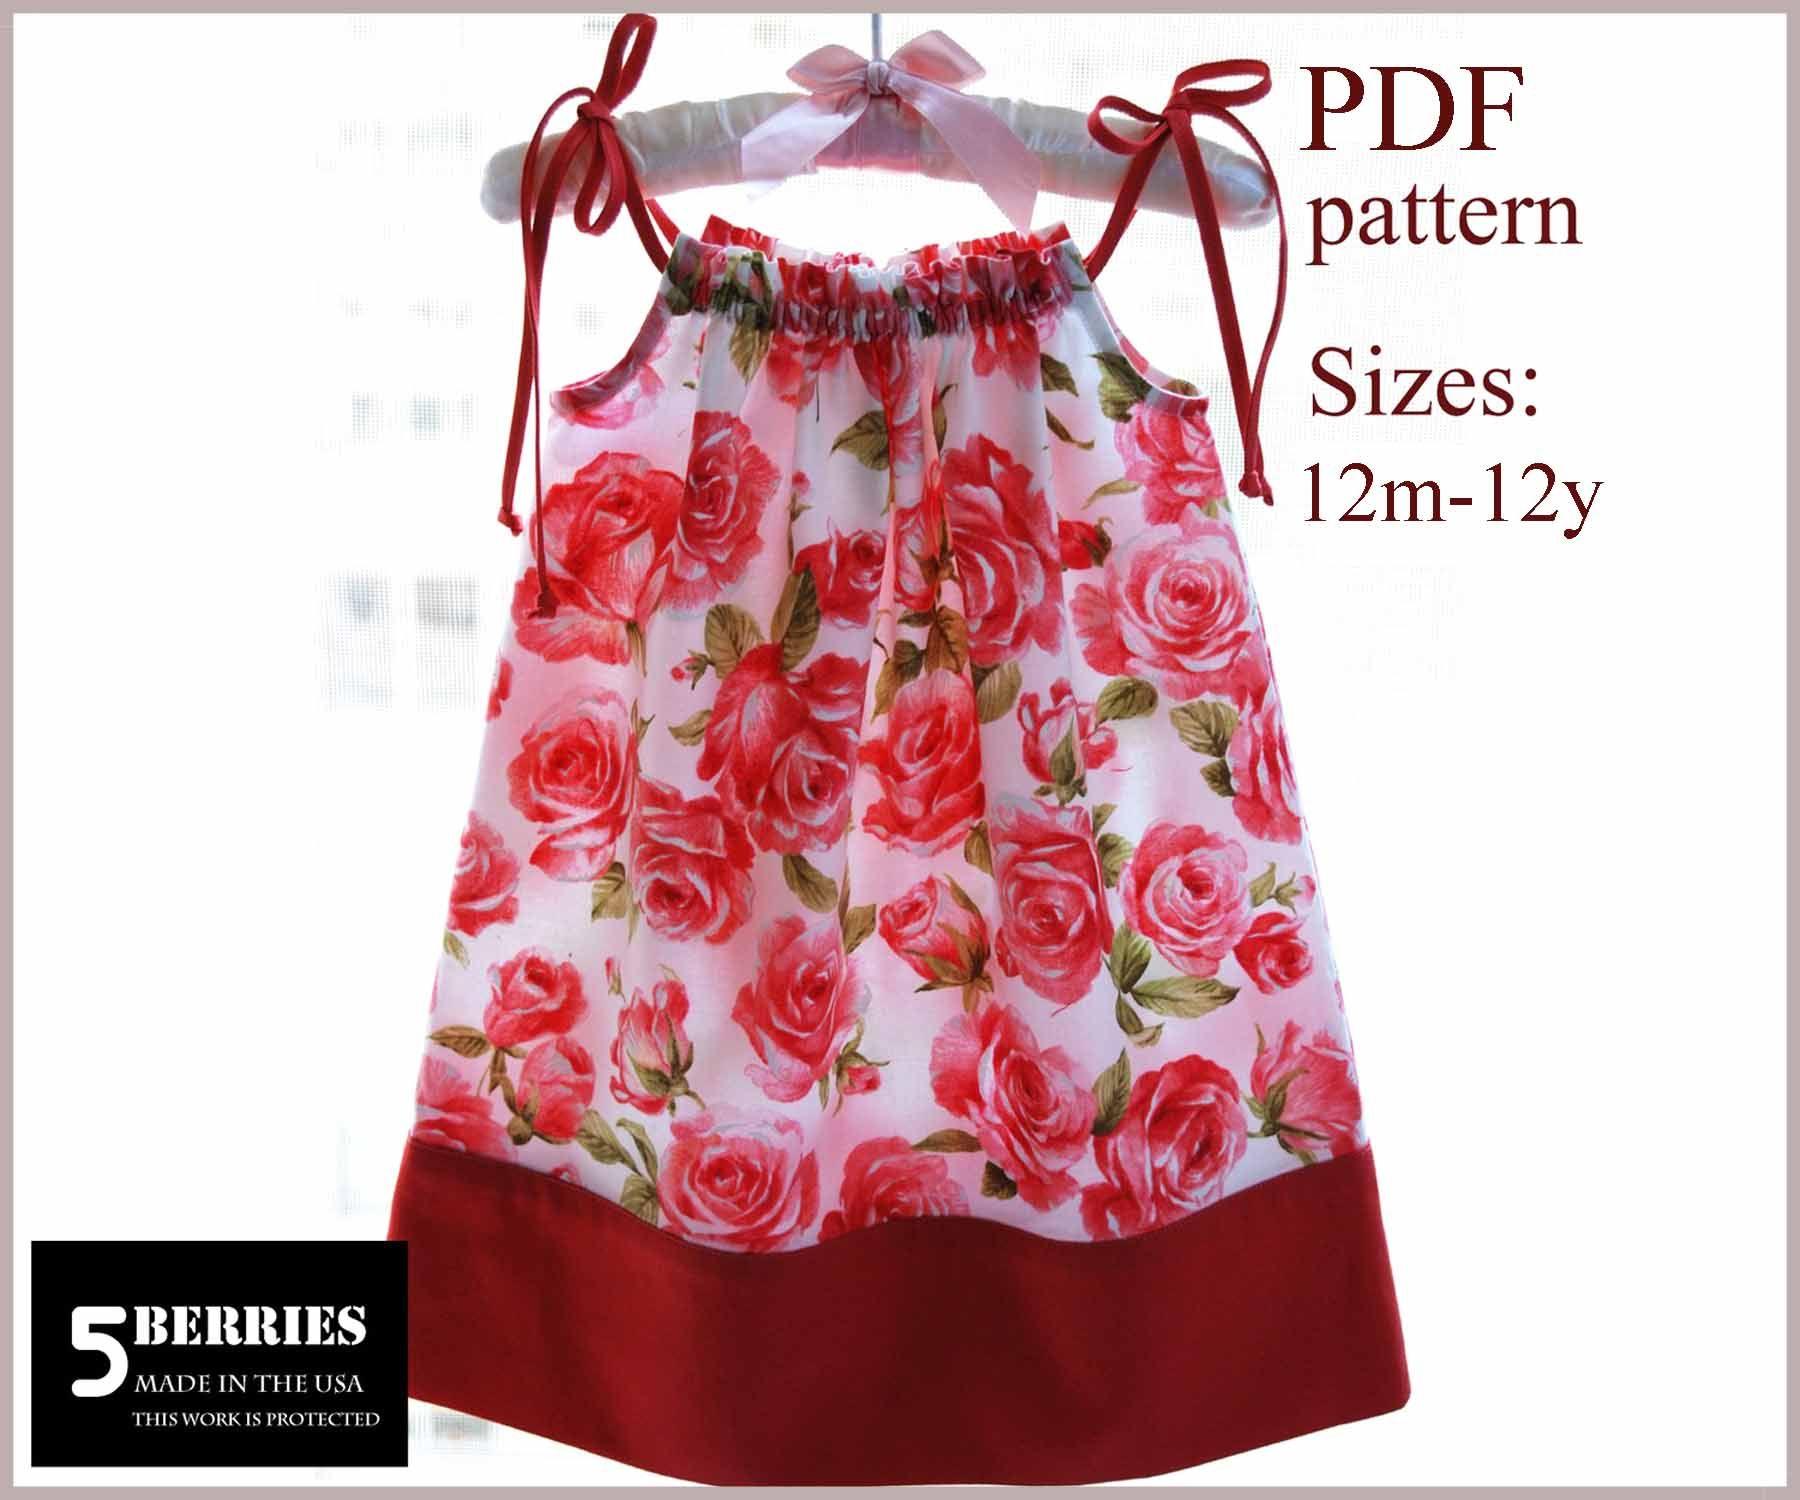 Tutorial \u2013 Pillowcase Dress Using Fat Quarters | The Mother Huddle I\u0027m wanting to